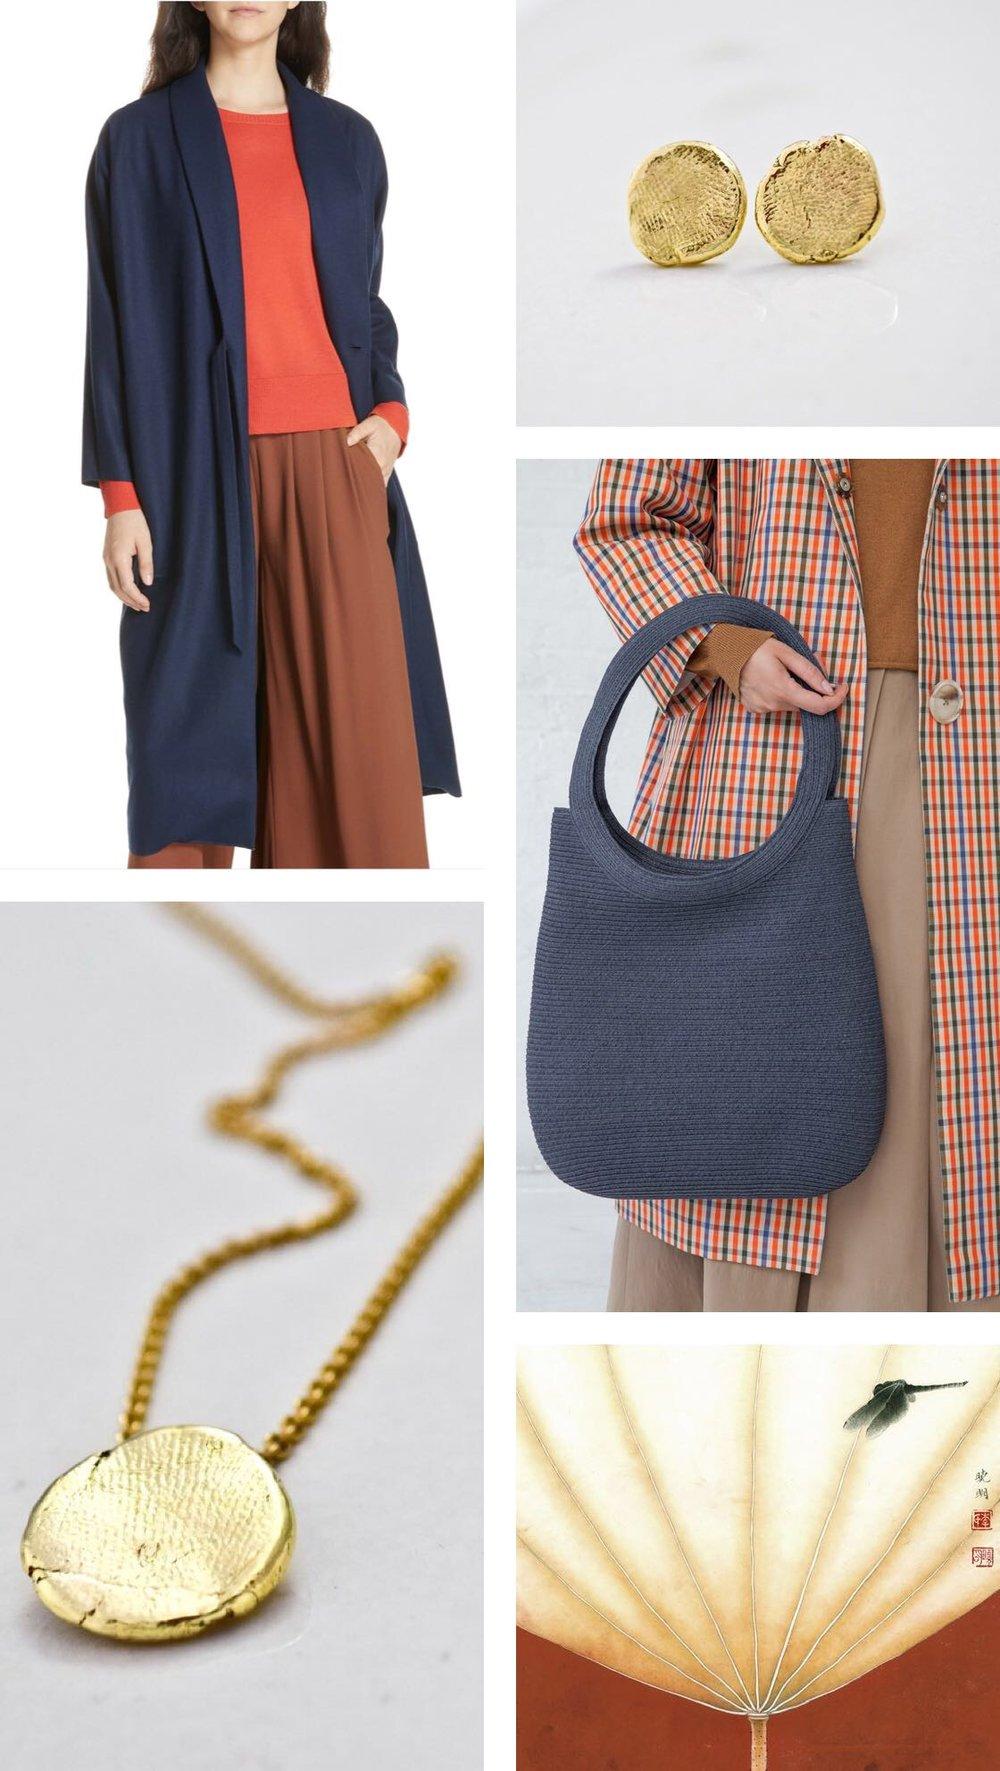 Eileen Fisher, Long Wool jacket, Blue  |    Bottone Earrings, 14K    |  *Samuji Amabel coat, Babs sweater and tall Flower basket  |    Bottone Pendant, 14K    |  Chinese painting.